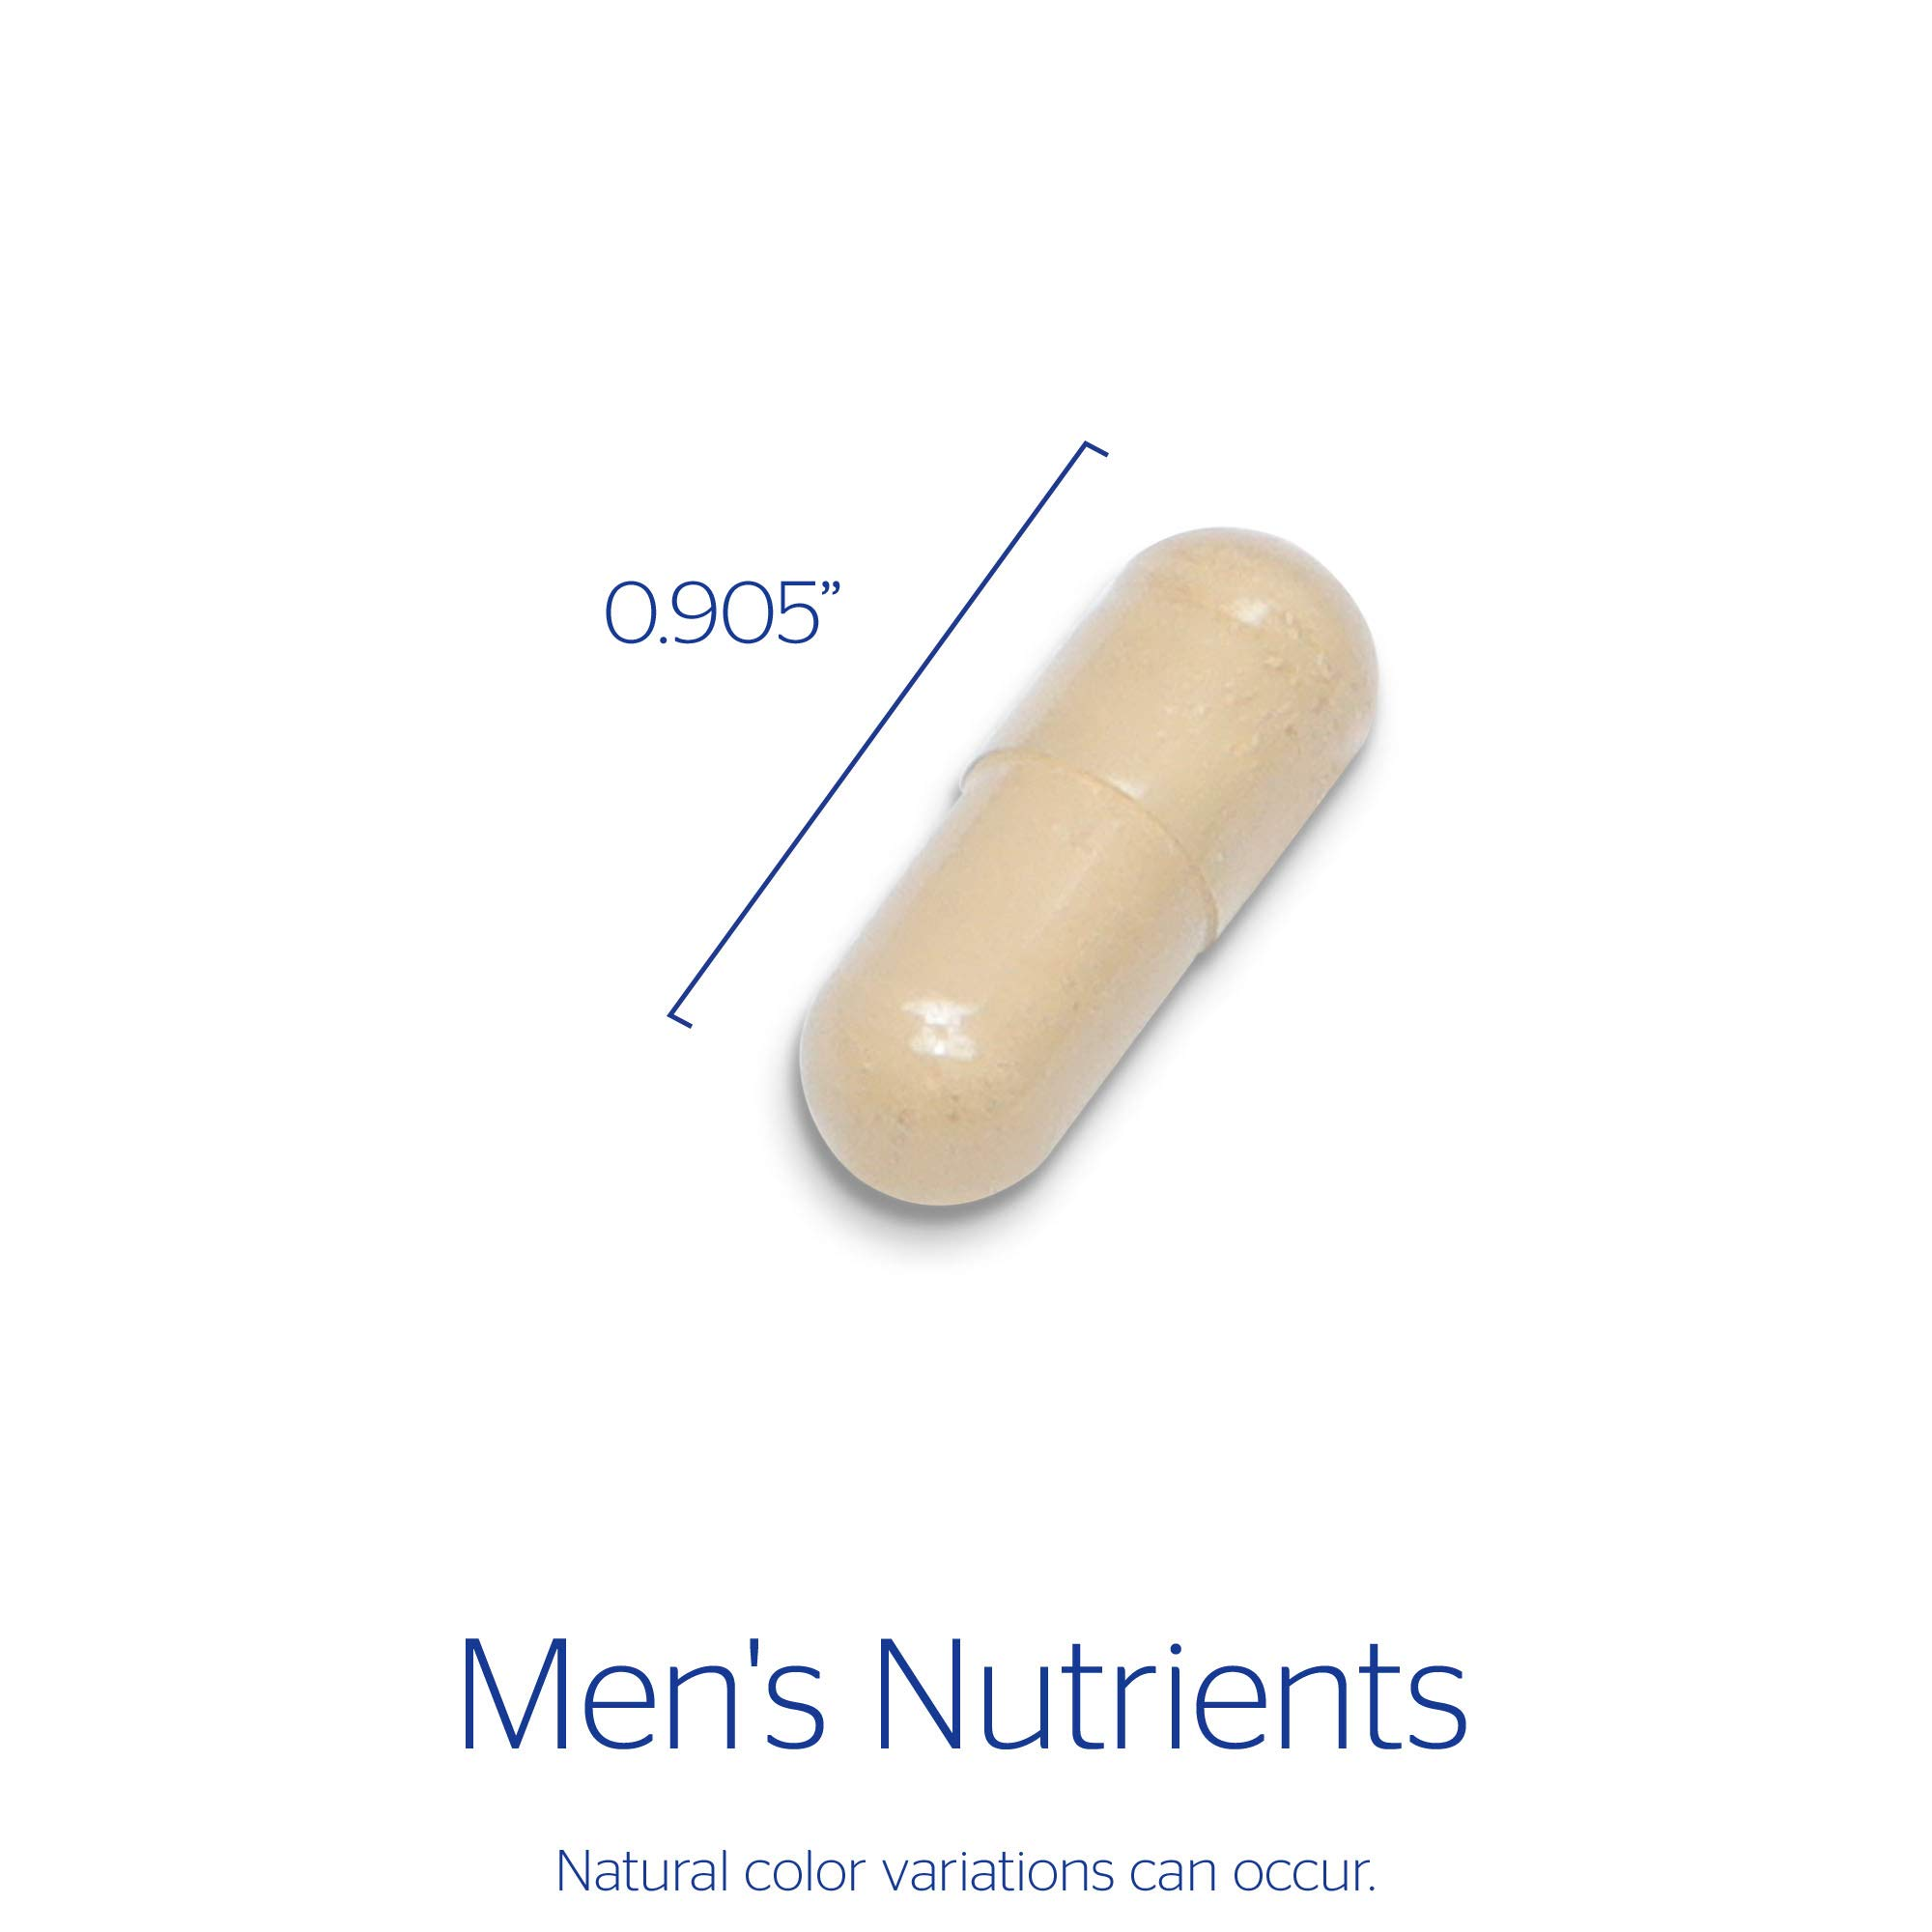 Pure Encapsulations - Men's Nutrients - Hypoallergenic Multivitamin/Mineral Complex for Men Over 40-180 Capsules by Pure Encapsulations (Image #3)